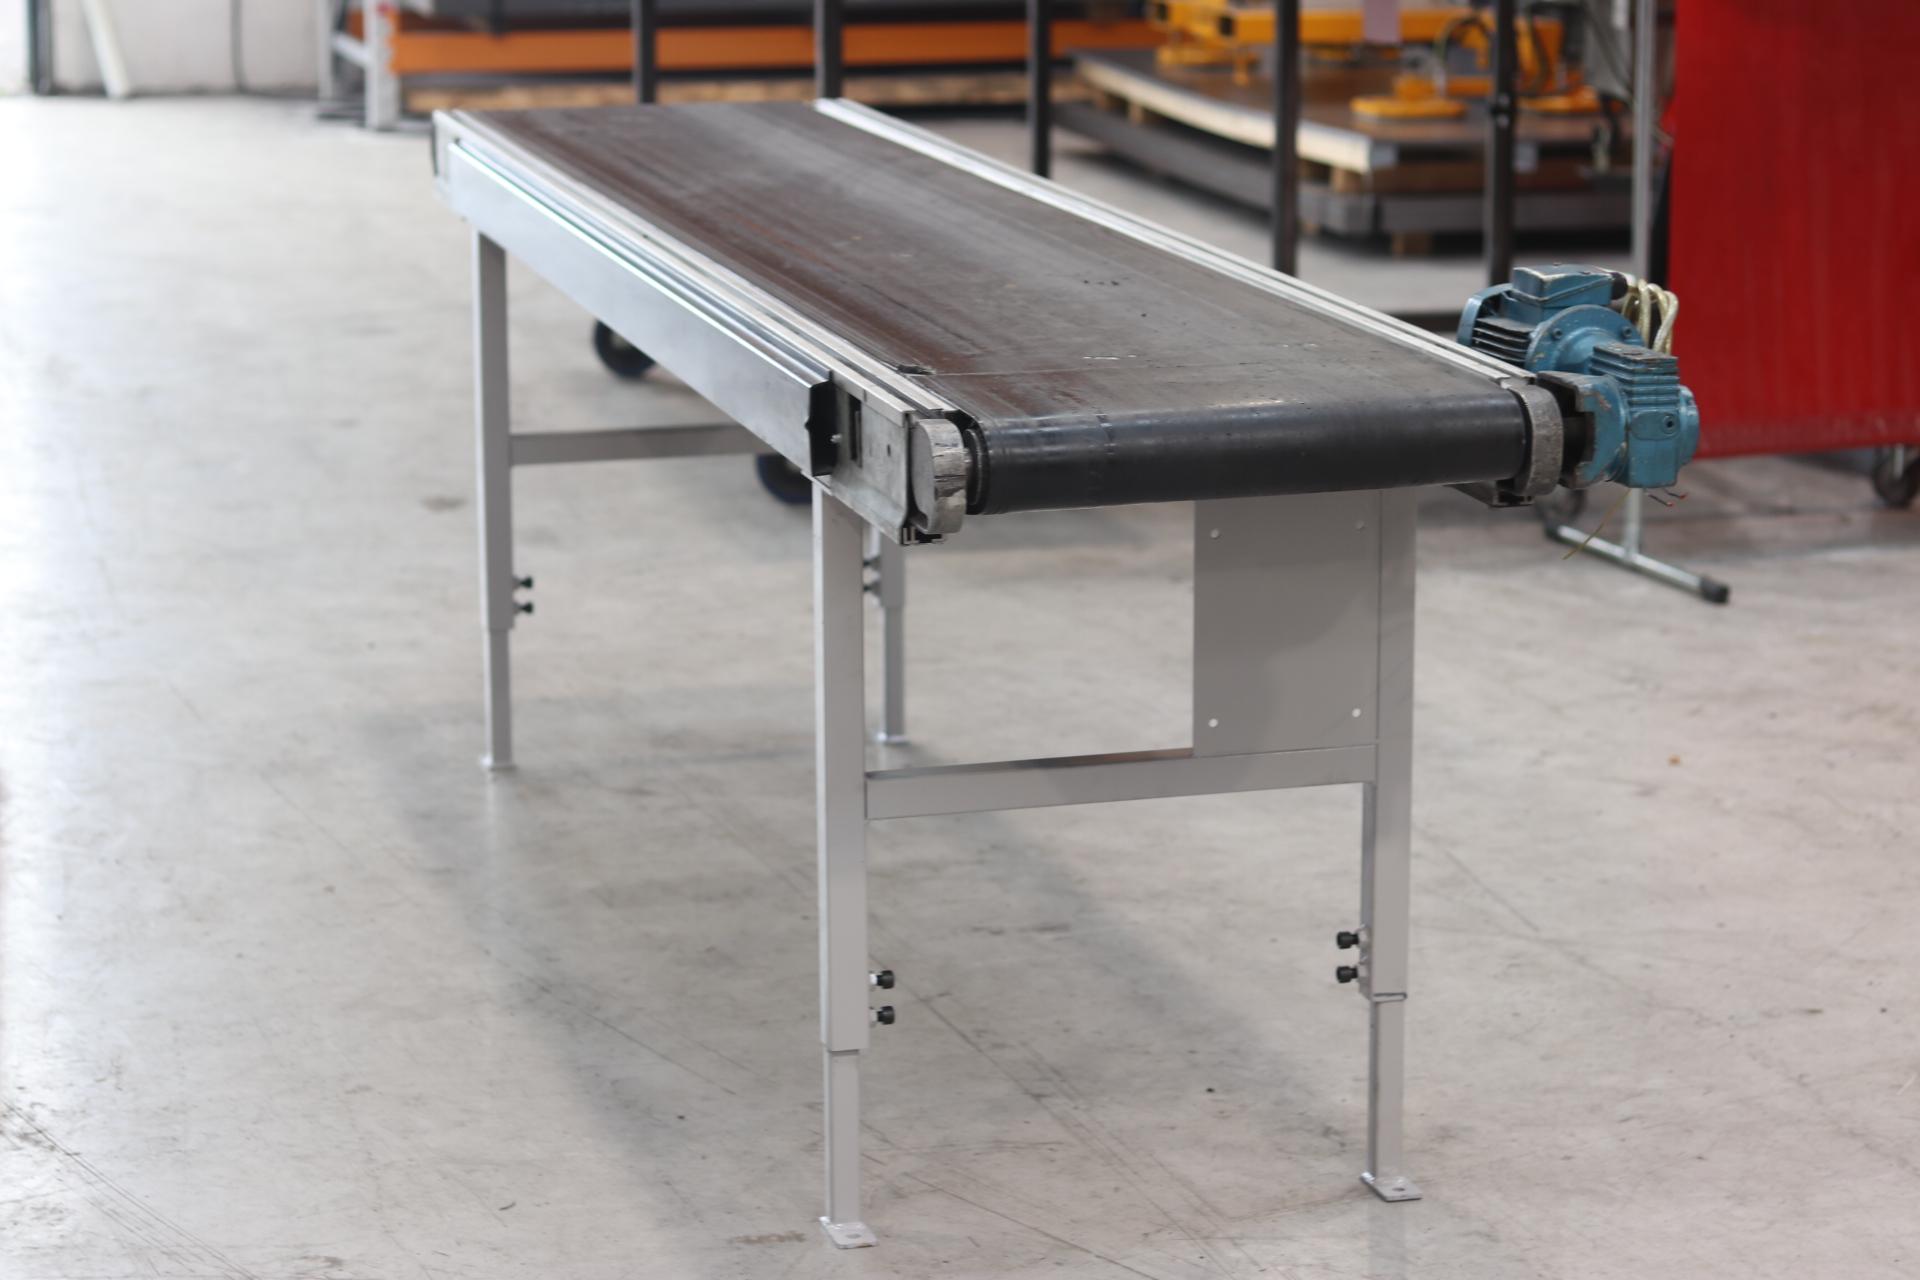 secondhand belt conveyor suppliers used conveyor systems buy conveyors conveyors for sale used old conveyors